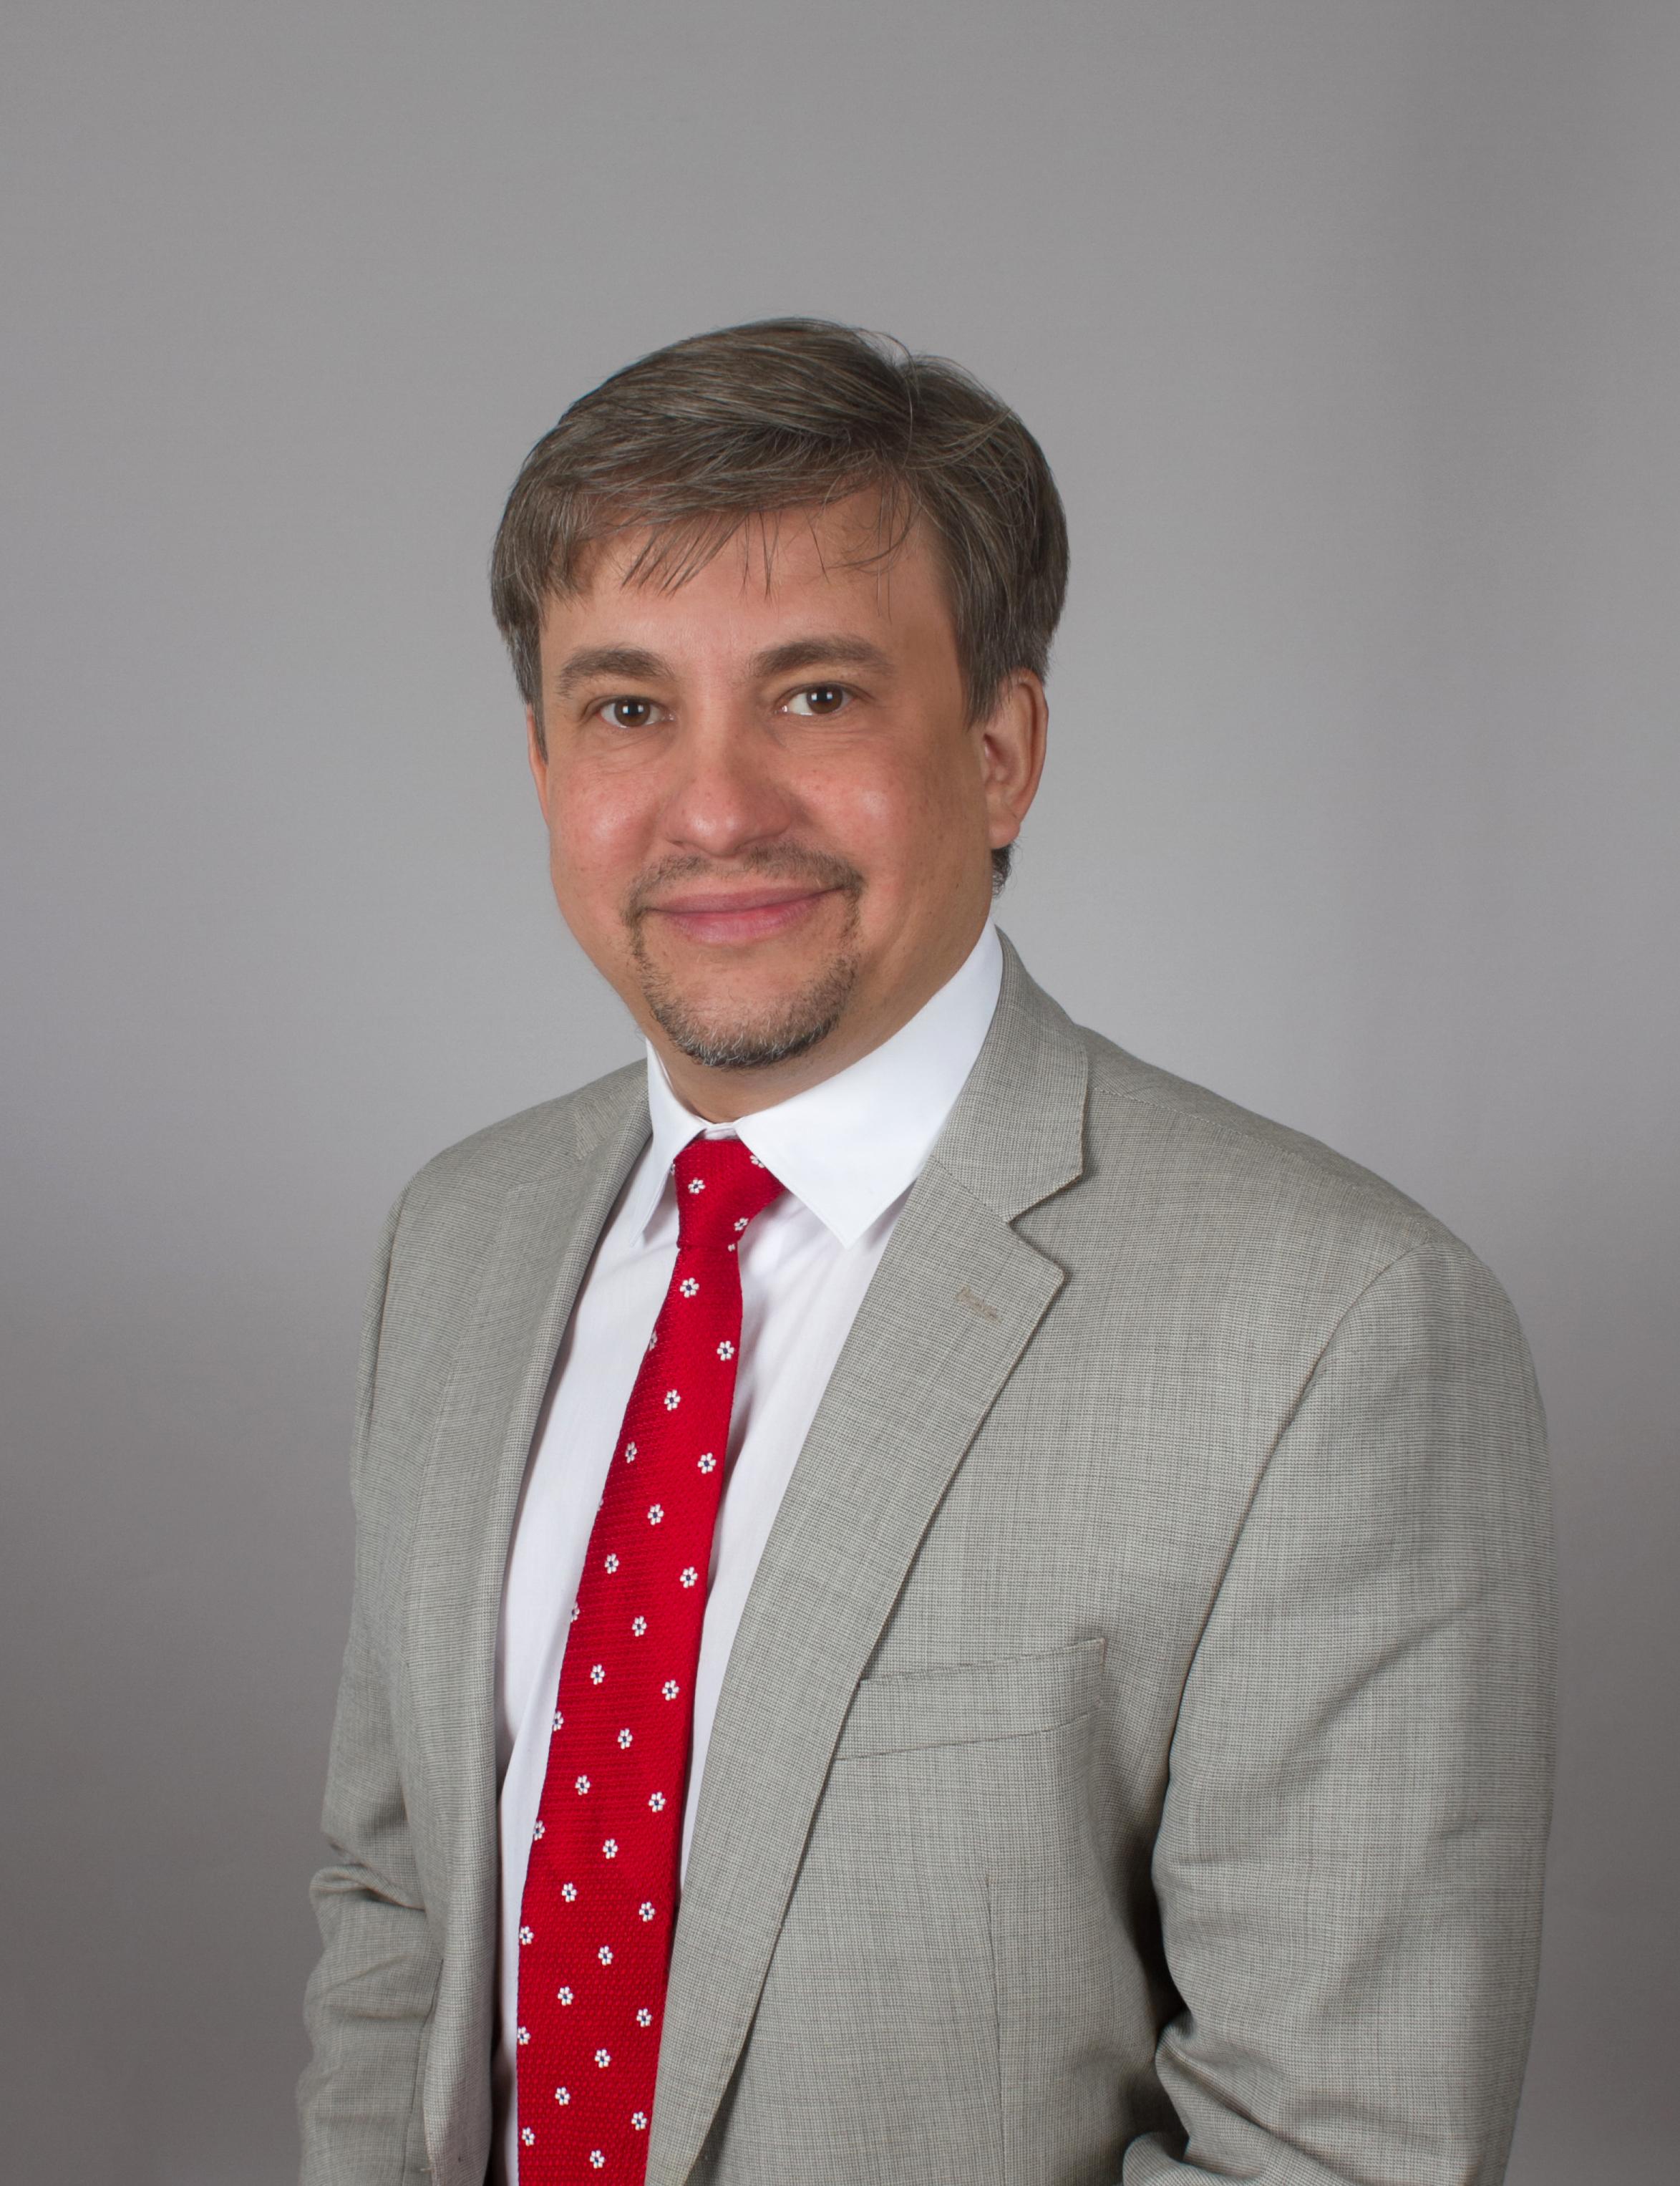 Denis Evseenko, MD, PhD, University of Southern California - Health Sciences